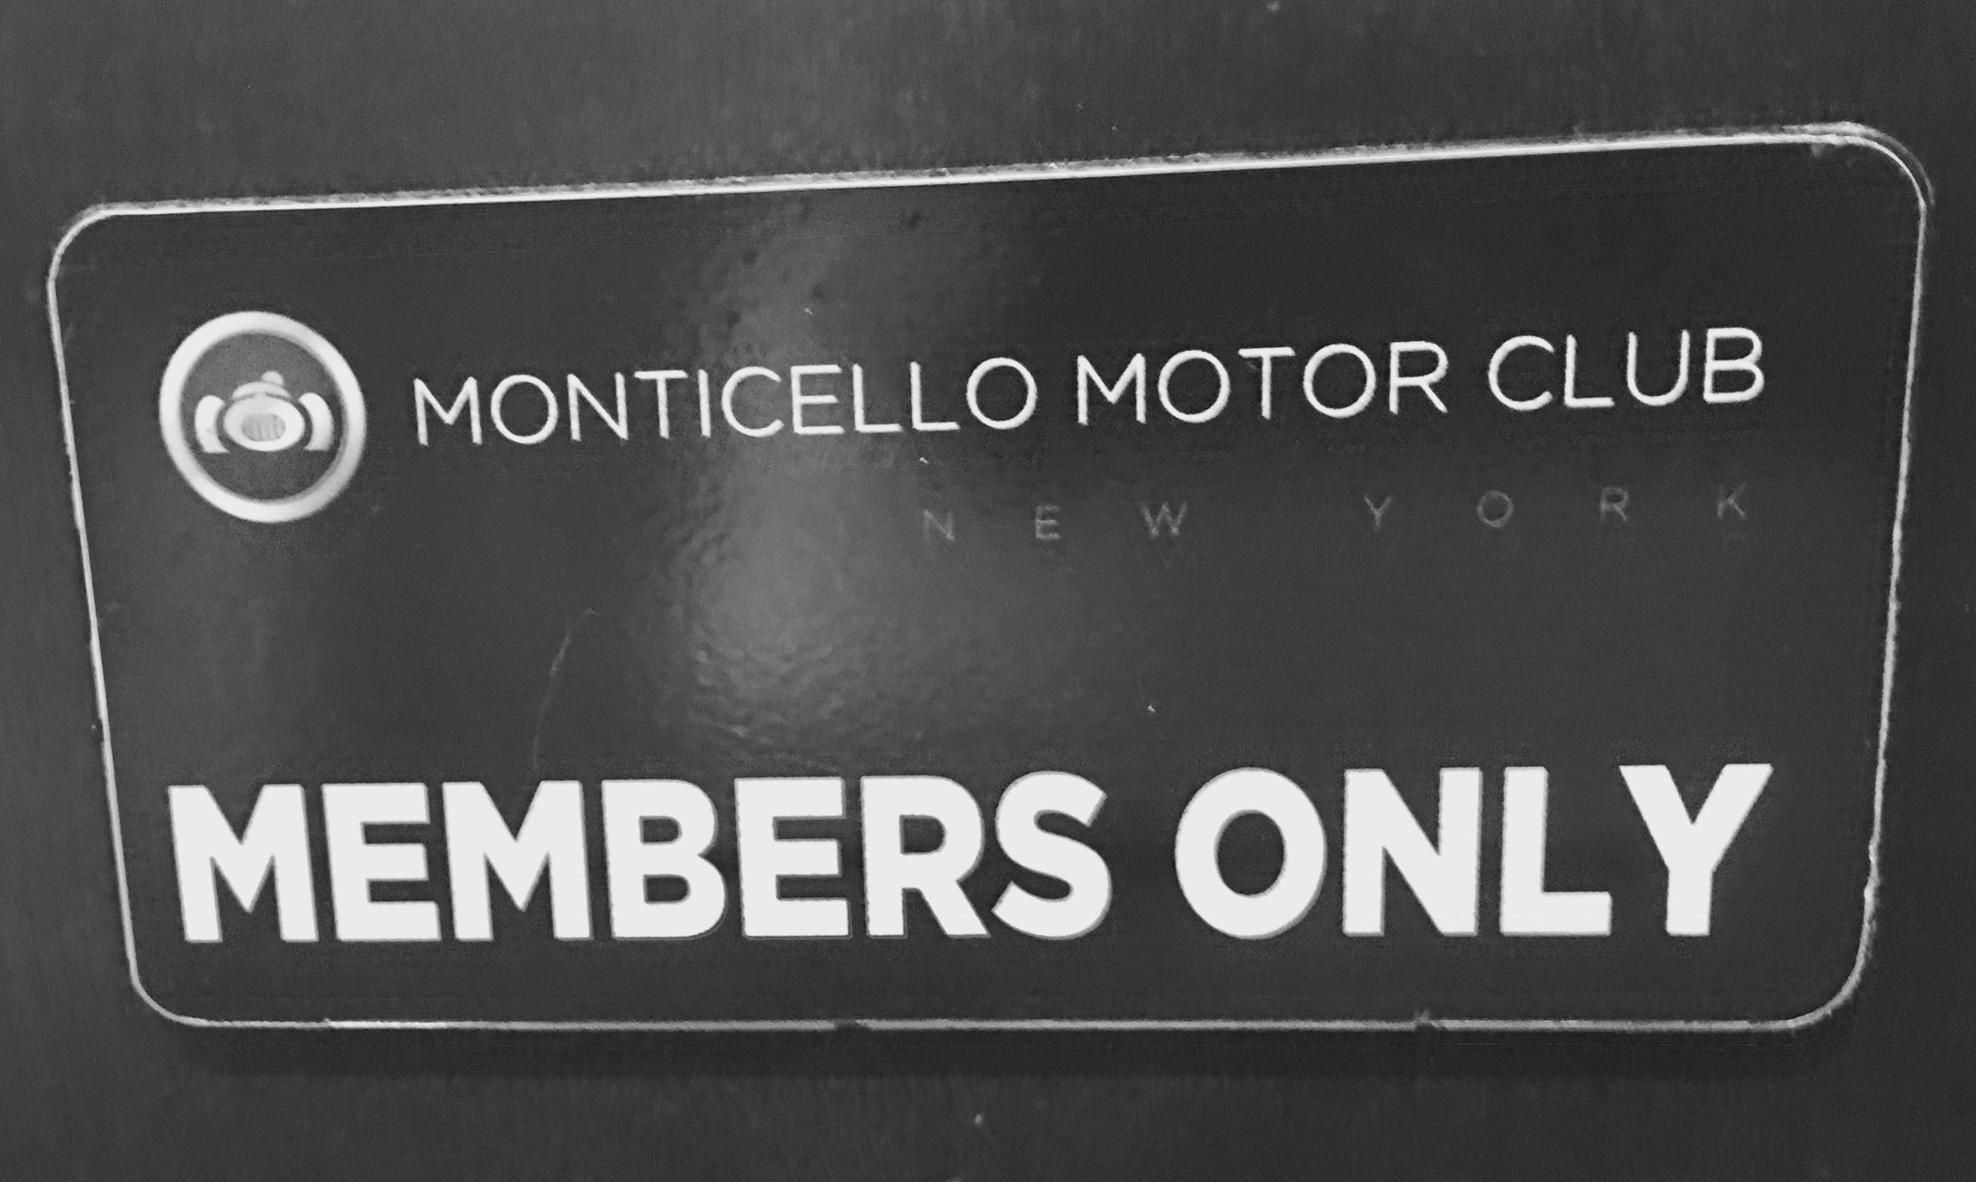 members only sign.jpg